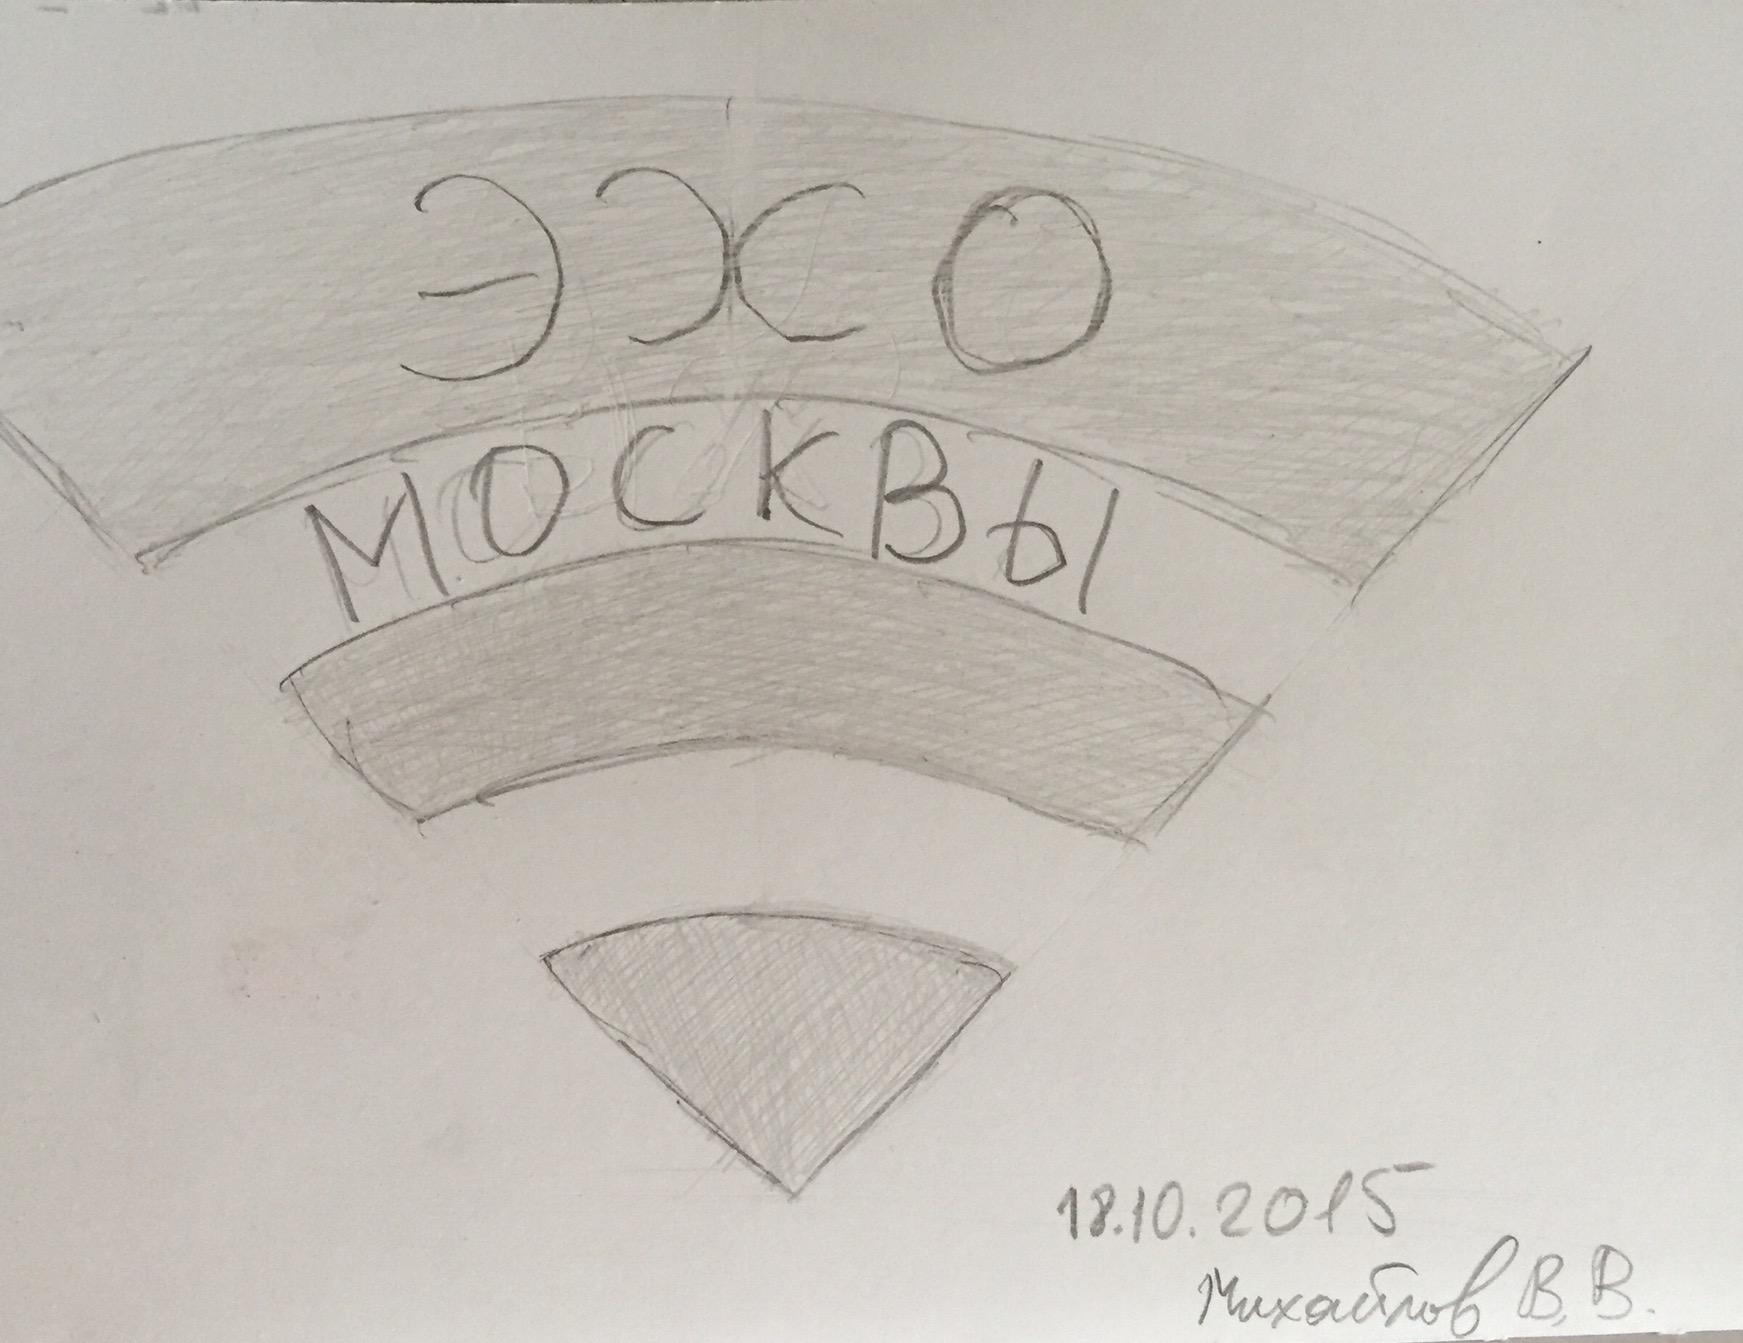 Дизайн логотипа р/с Эхо Москвы. фото f_9615623c46f9c77f.jpg